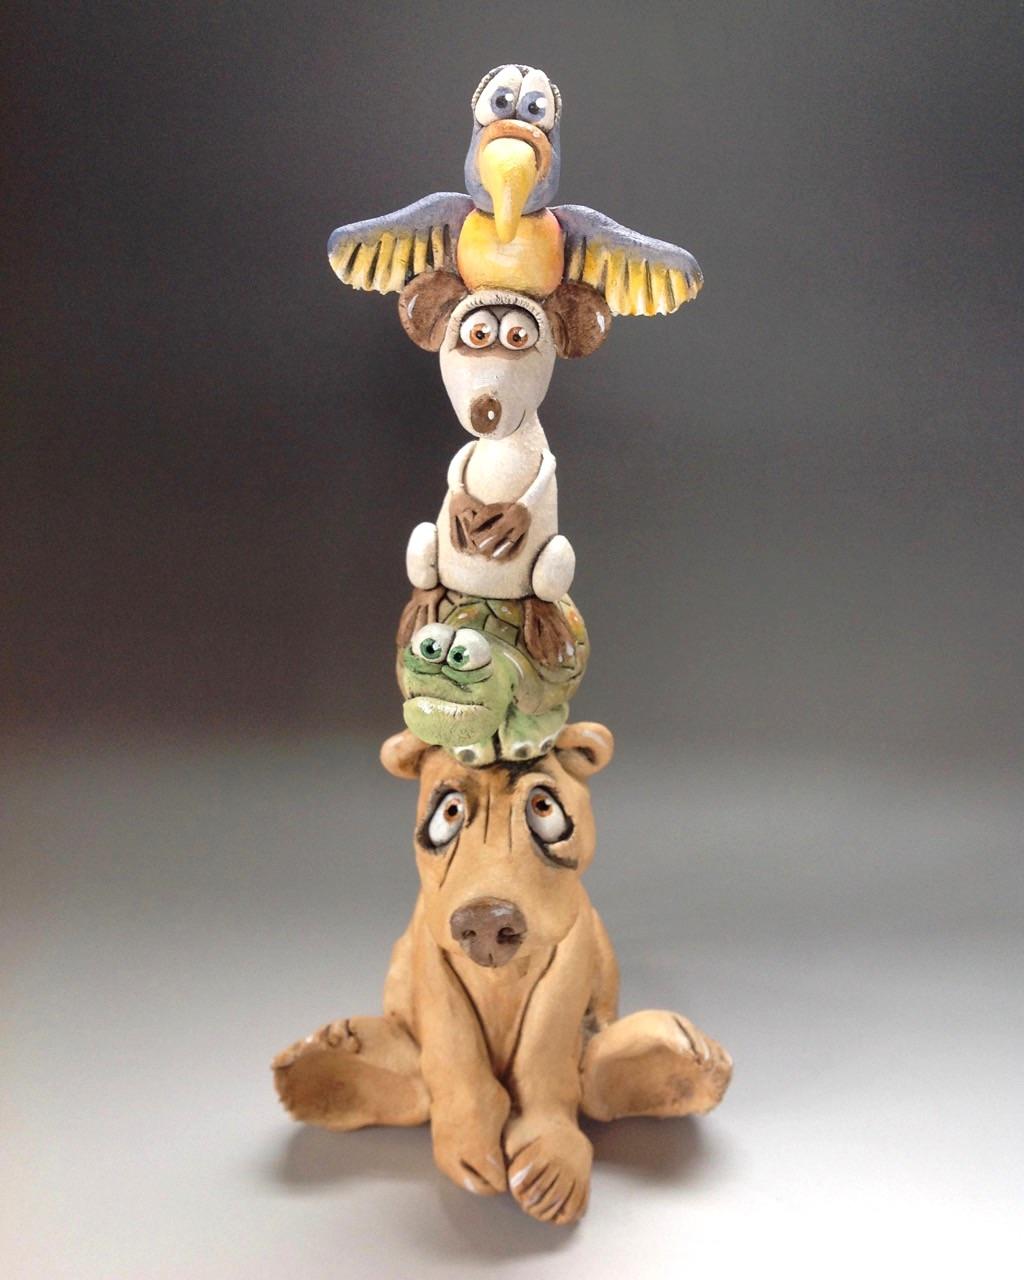 Animal Totem Sculpture Ceramic Pottery